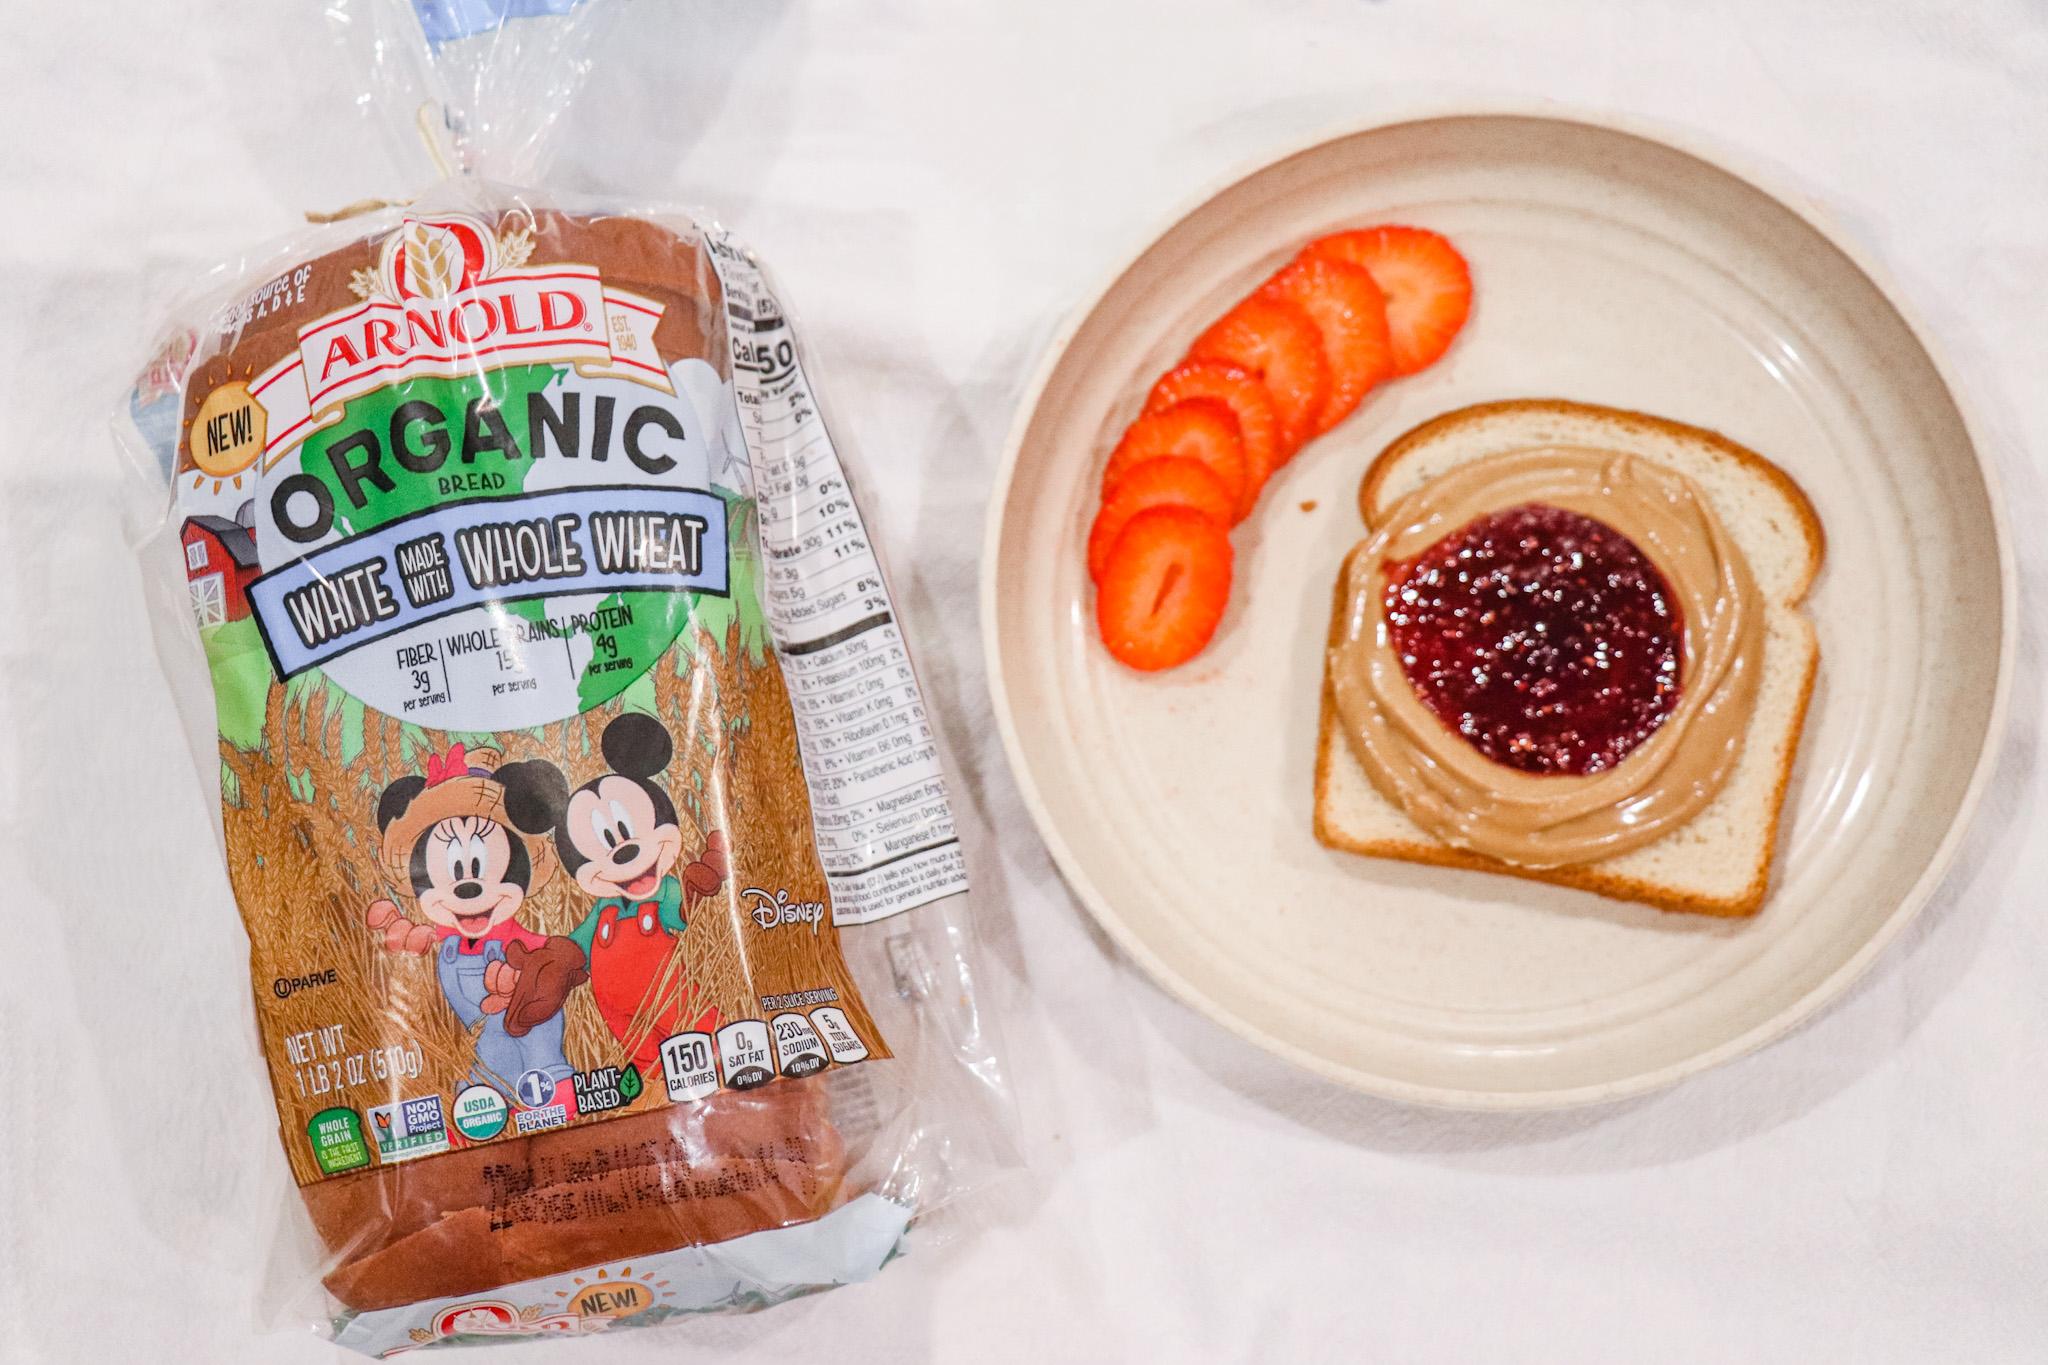 Arnold Bread Whole Wheat White Bread - Peanut Butter Jelly Sandwiches